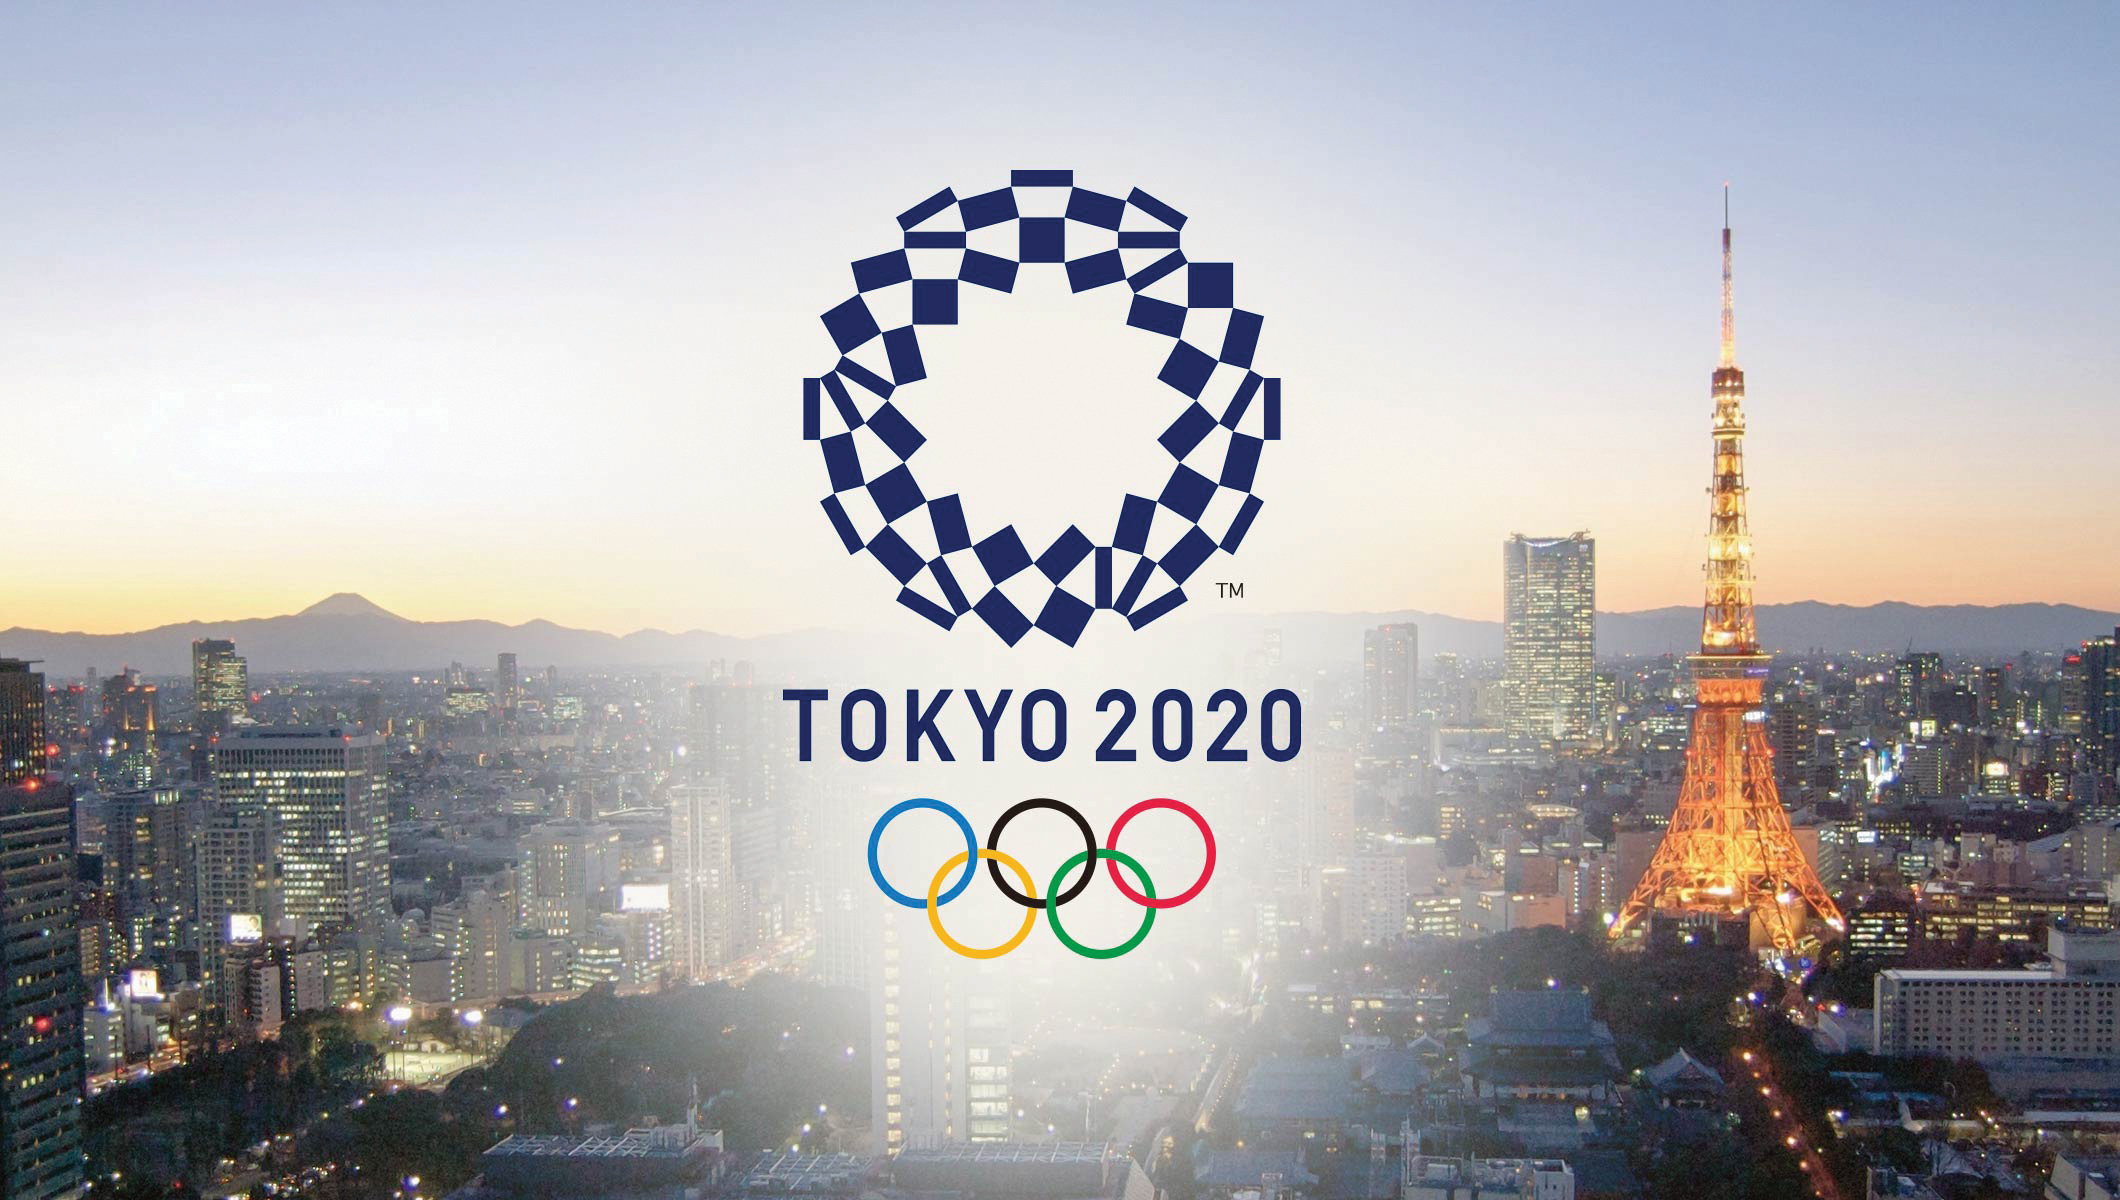 Bridgestone adjusts to prepare for 20 Olympics in Tokyo   Rubber ...